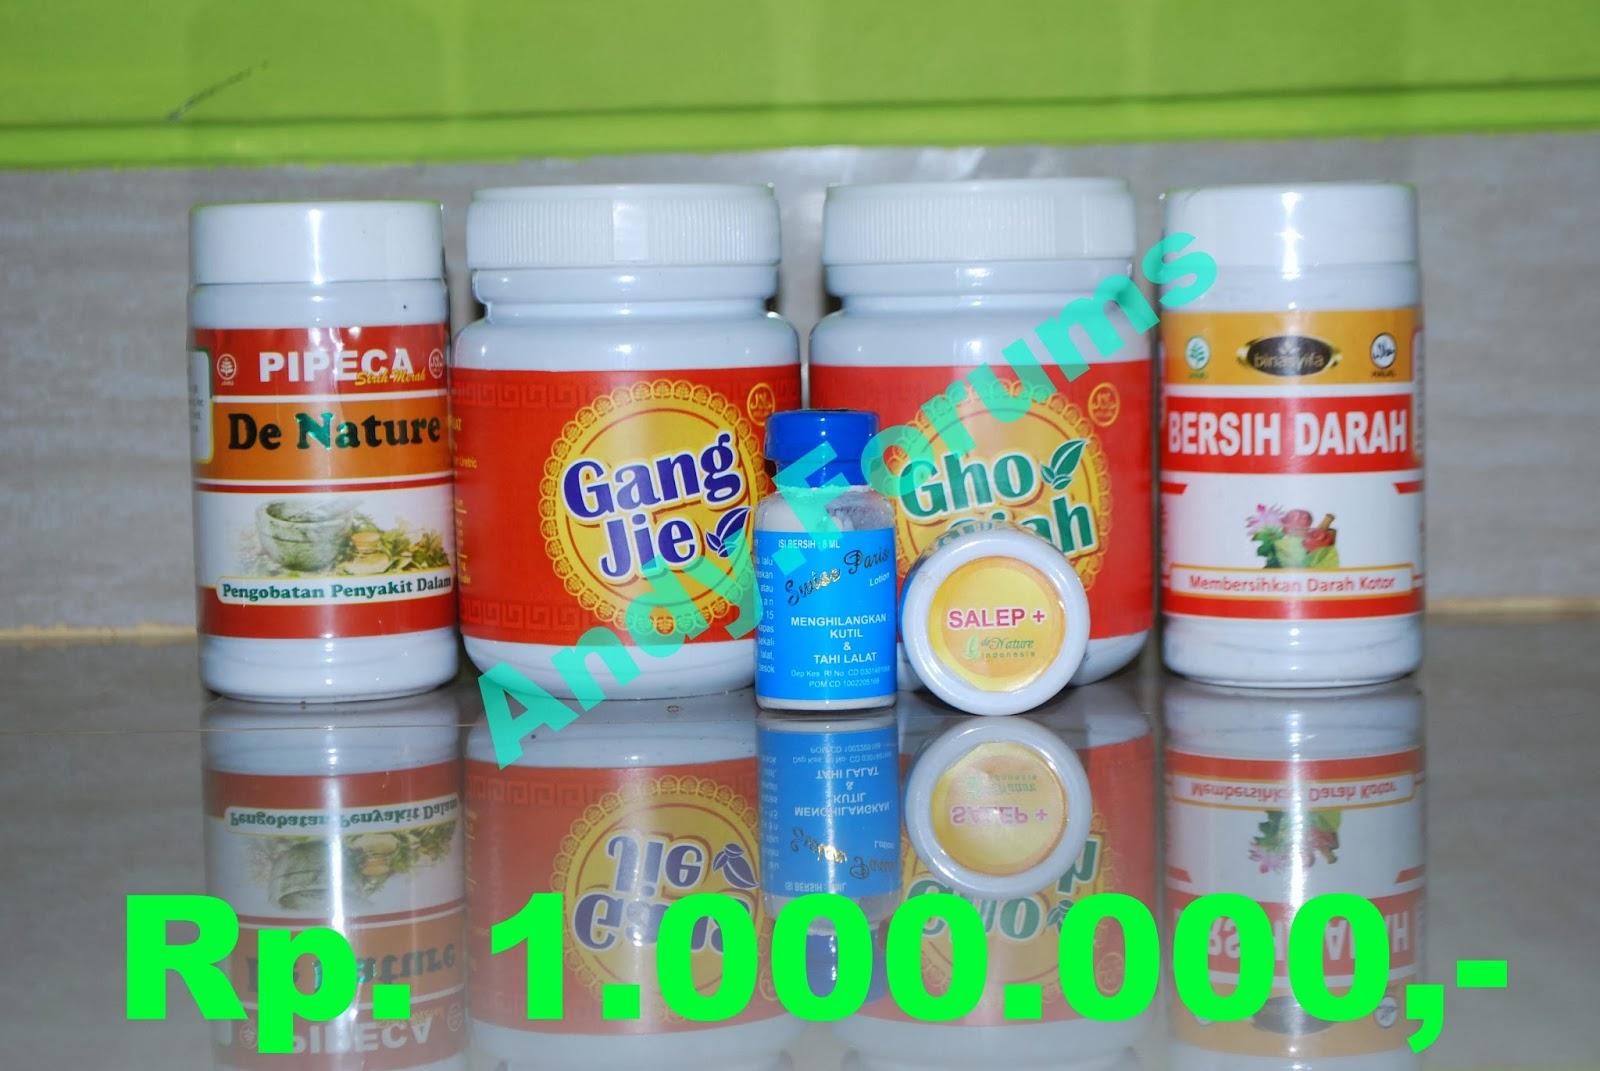 http://obat-kutil1.blogspot.com/2014/01/artikel-obat-kutil-pada-kemaluan.html